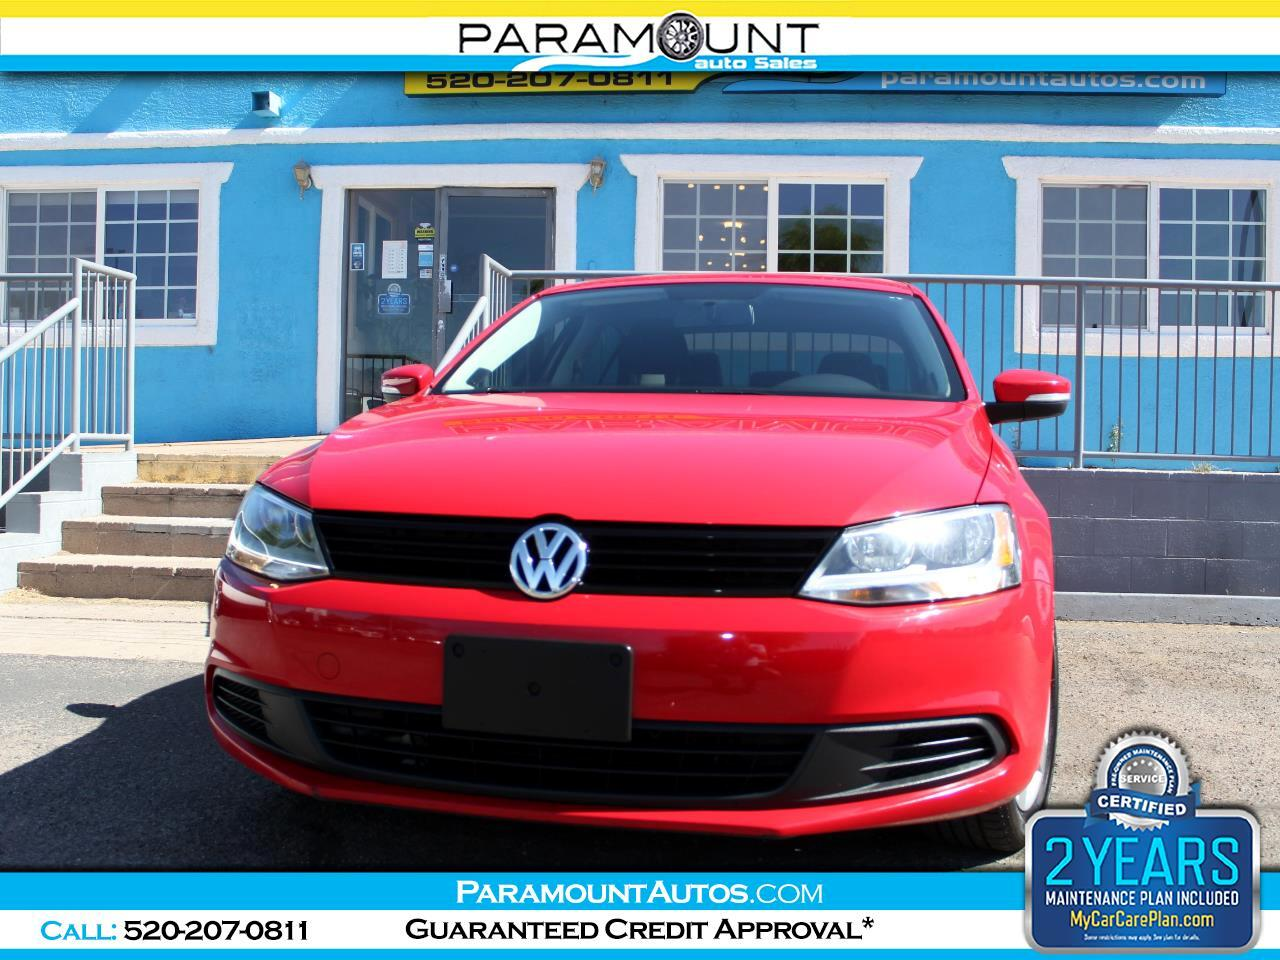 2012 Volkswagen Jetta TDi Premium